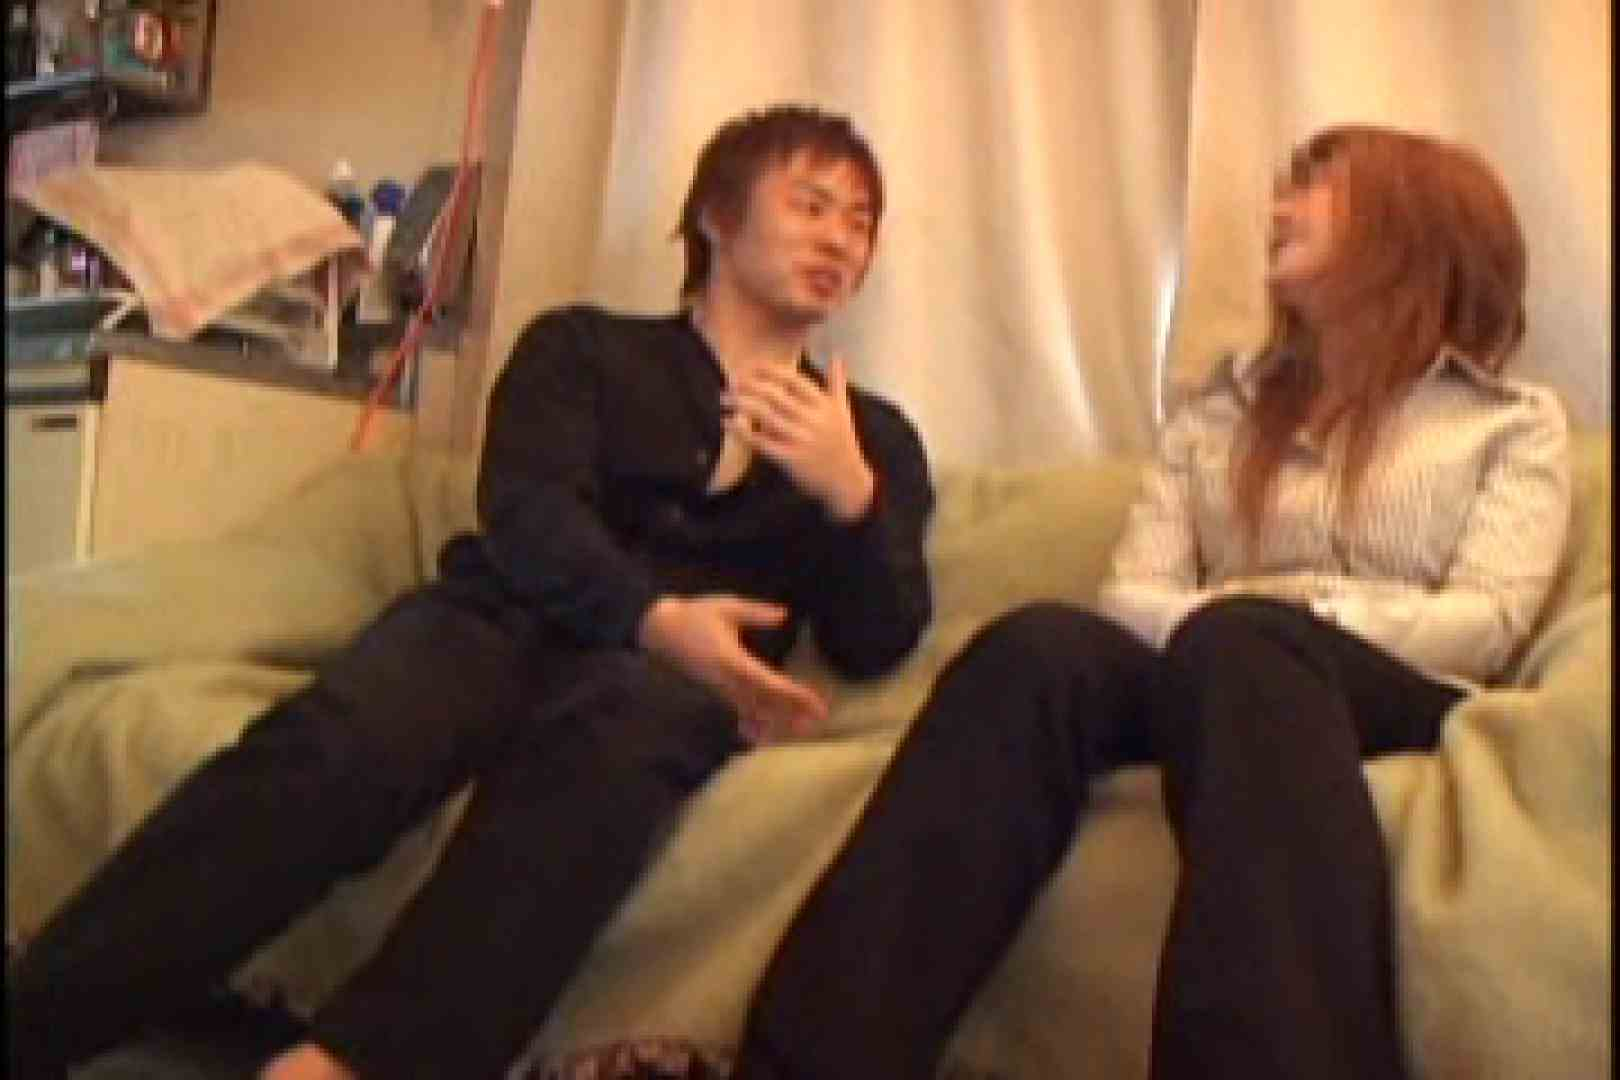 BEST OF イケメン!!男目線のガチSEX vol.03(対女性作品) お口で! ゲイ素人エロ画像 112pic